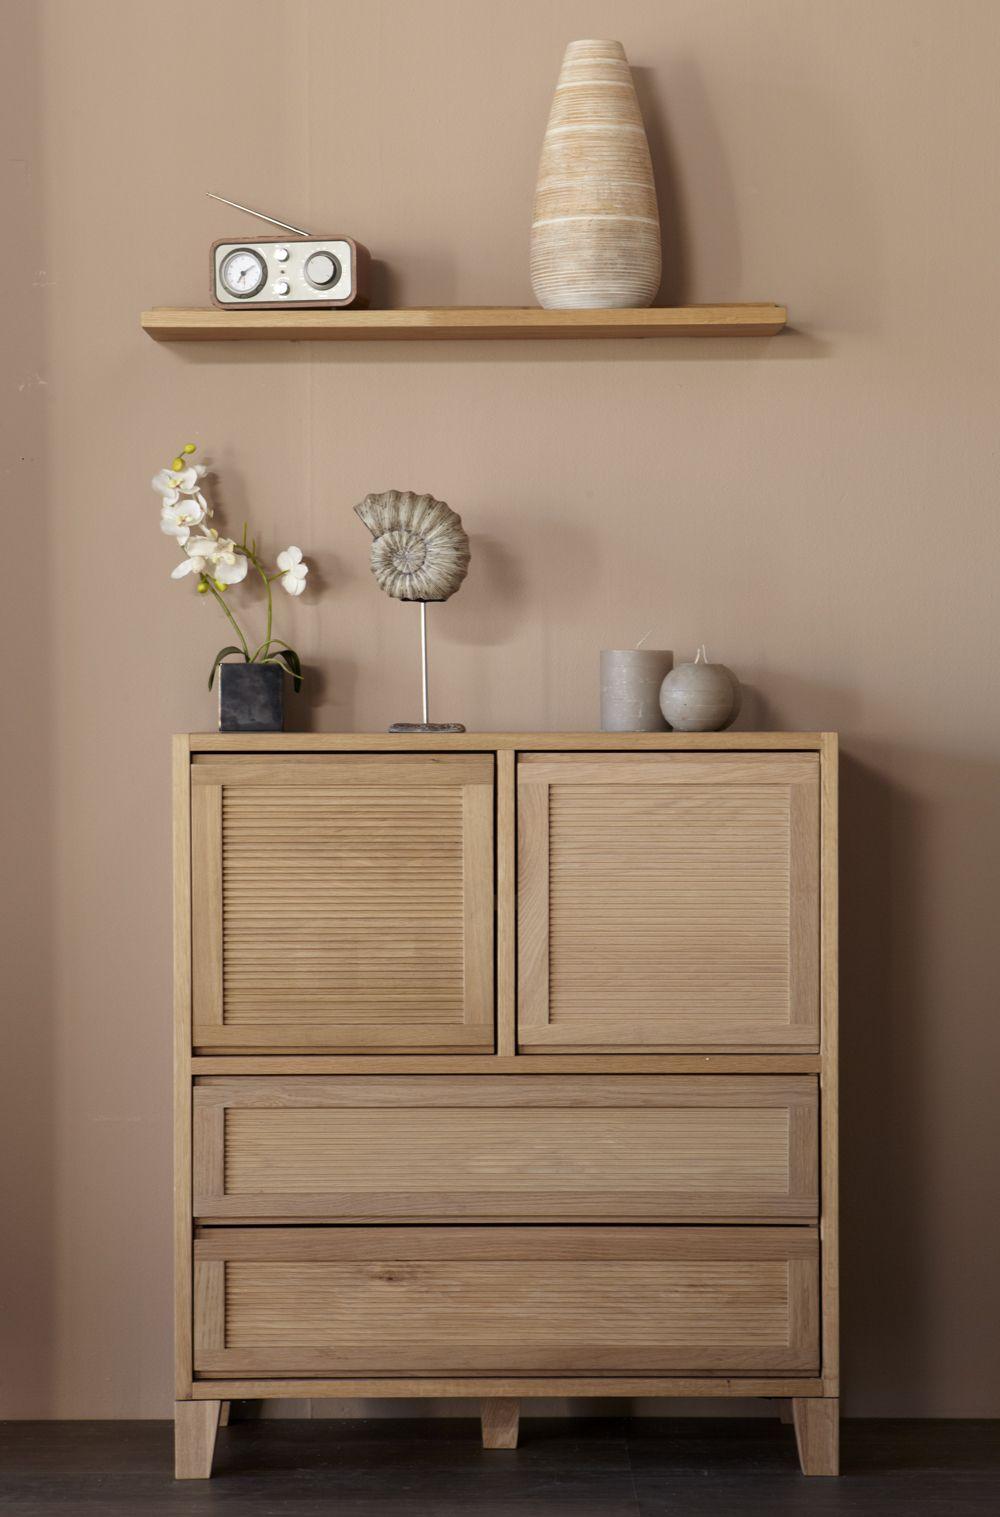 vitrine alinea good des photos meuble fer ikea cuisine toilette et ikea meuble vitrine images. Black Bedroom Furniture Sets. Home Design Ideas